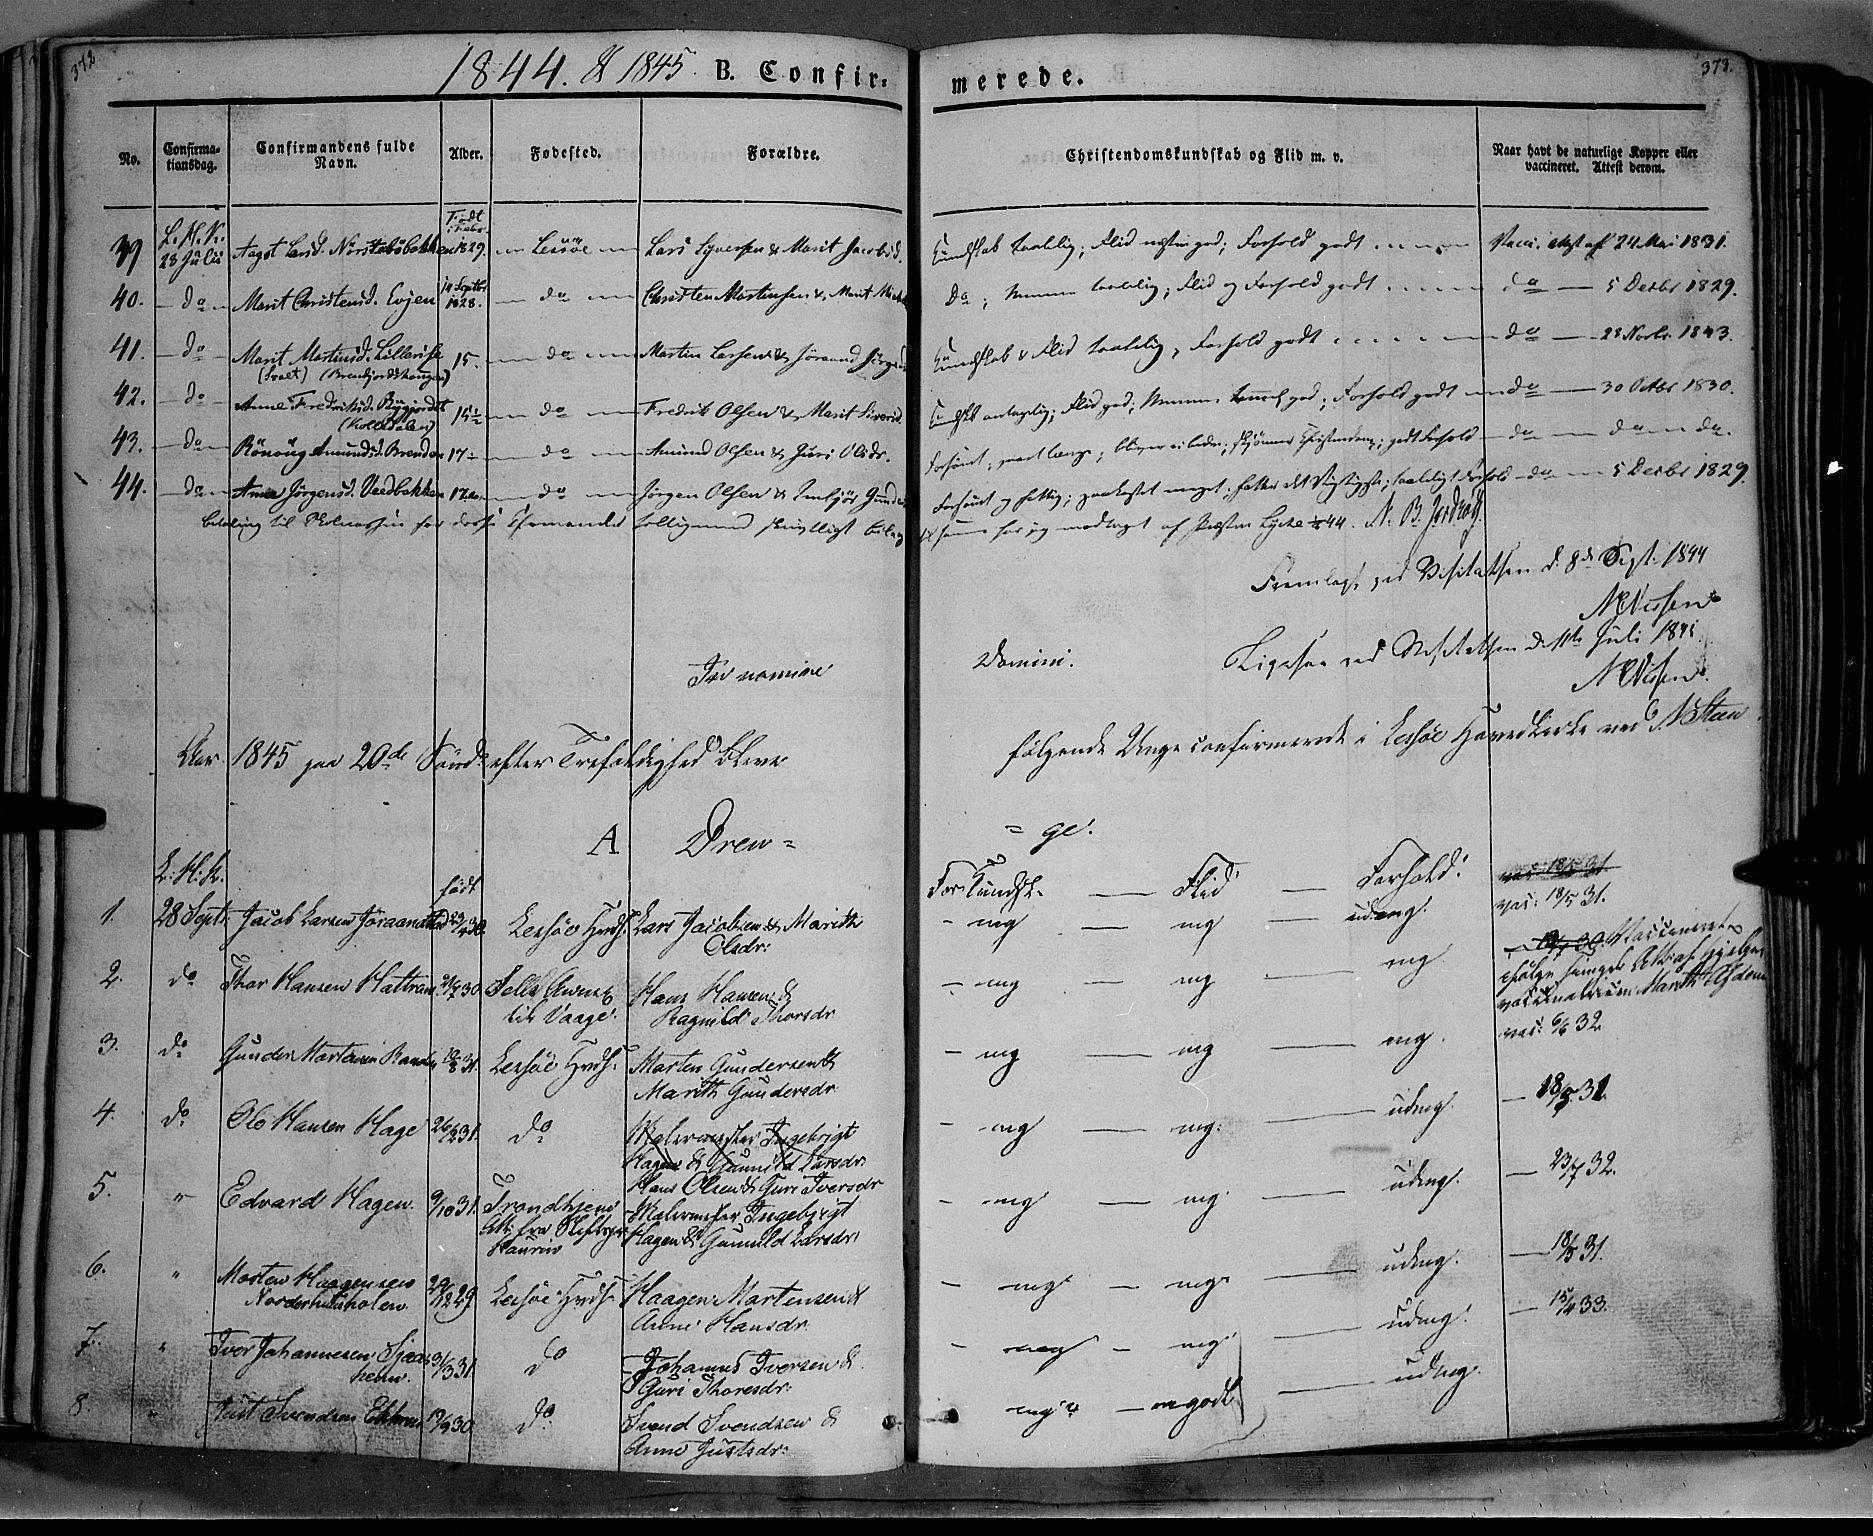 SAH, Lesja prestekontor, Ministerialbok nr. 6A, 1843-1854, s. 372-373